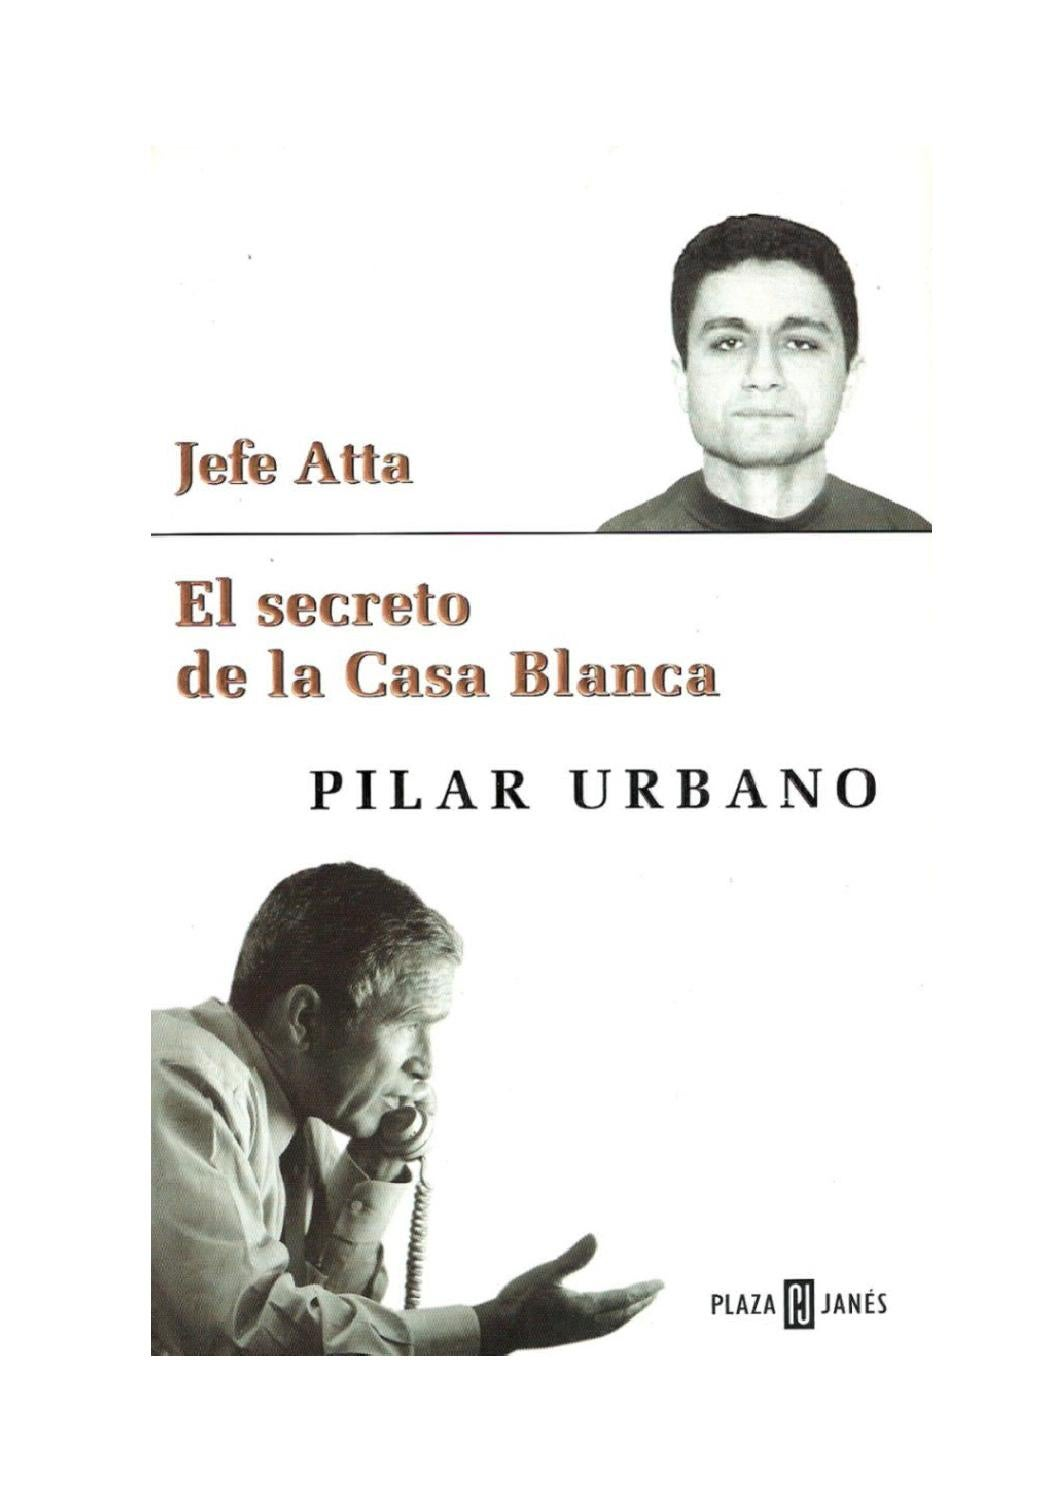 san francisco f383b 82012 Pilar Urbano. Jefe Atta. El secreto de la Casa Blanca by Mohamed Benali -  issuu